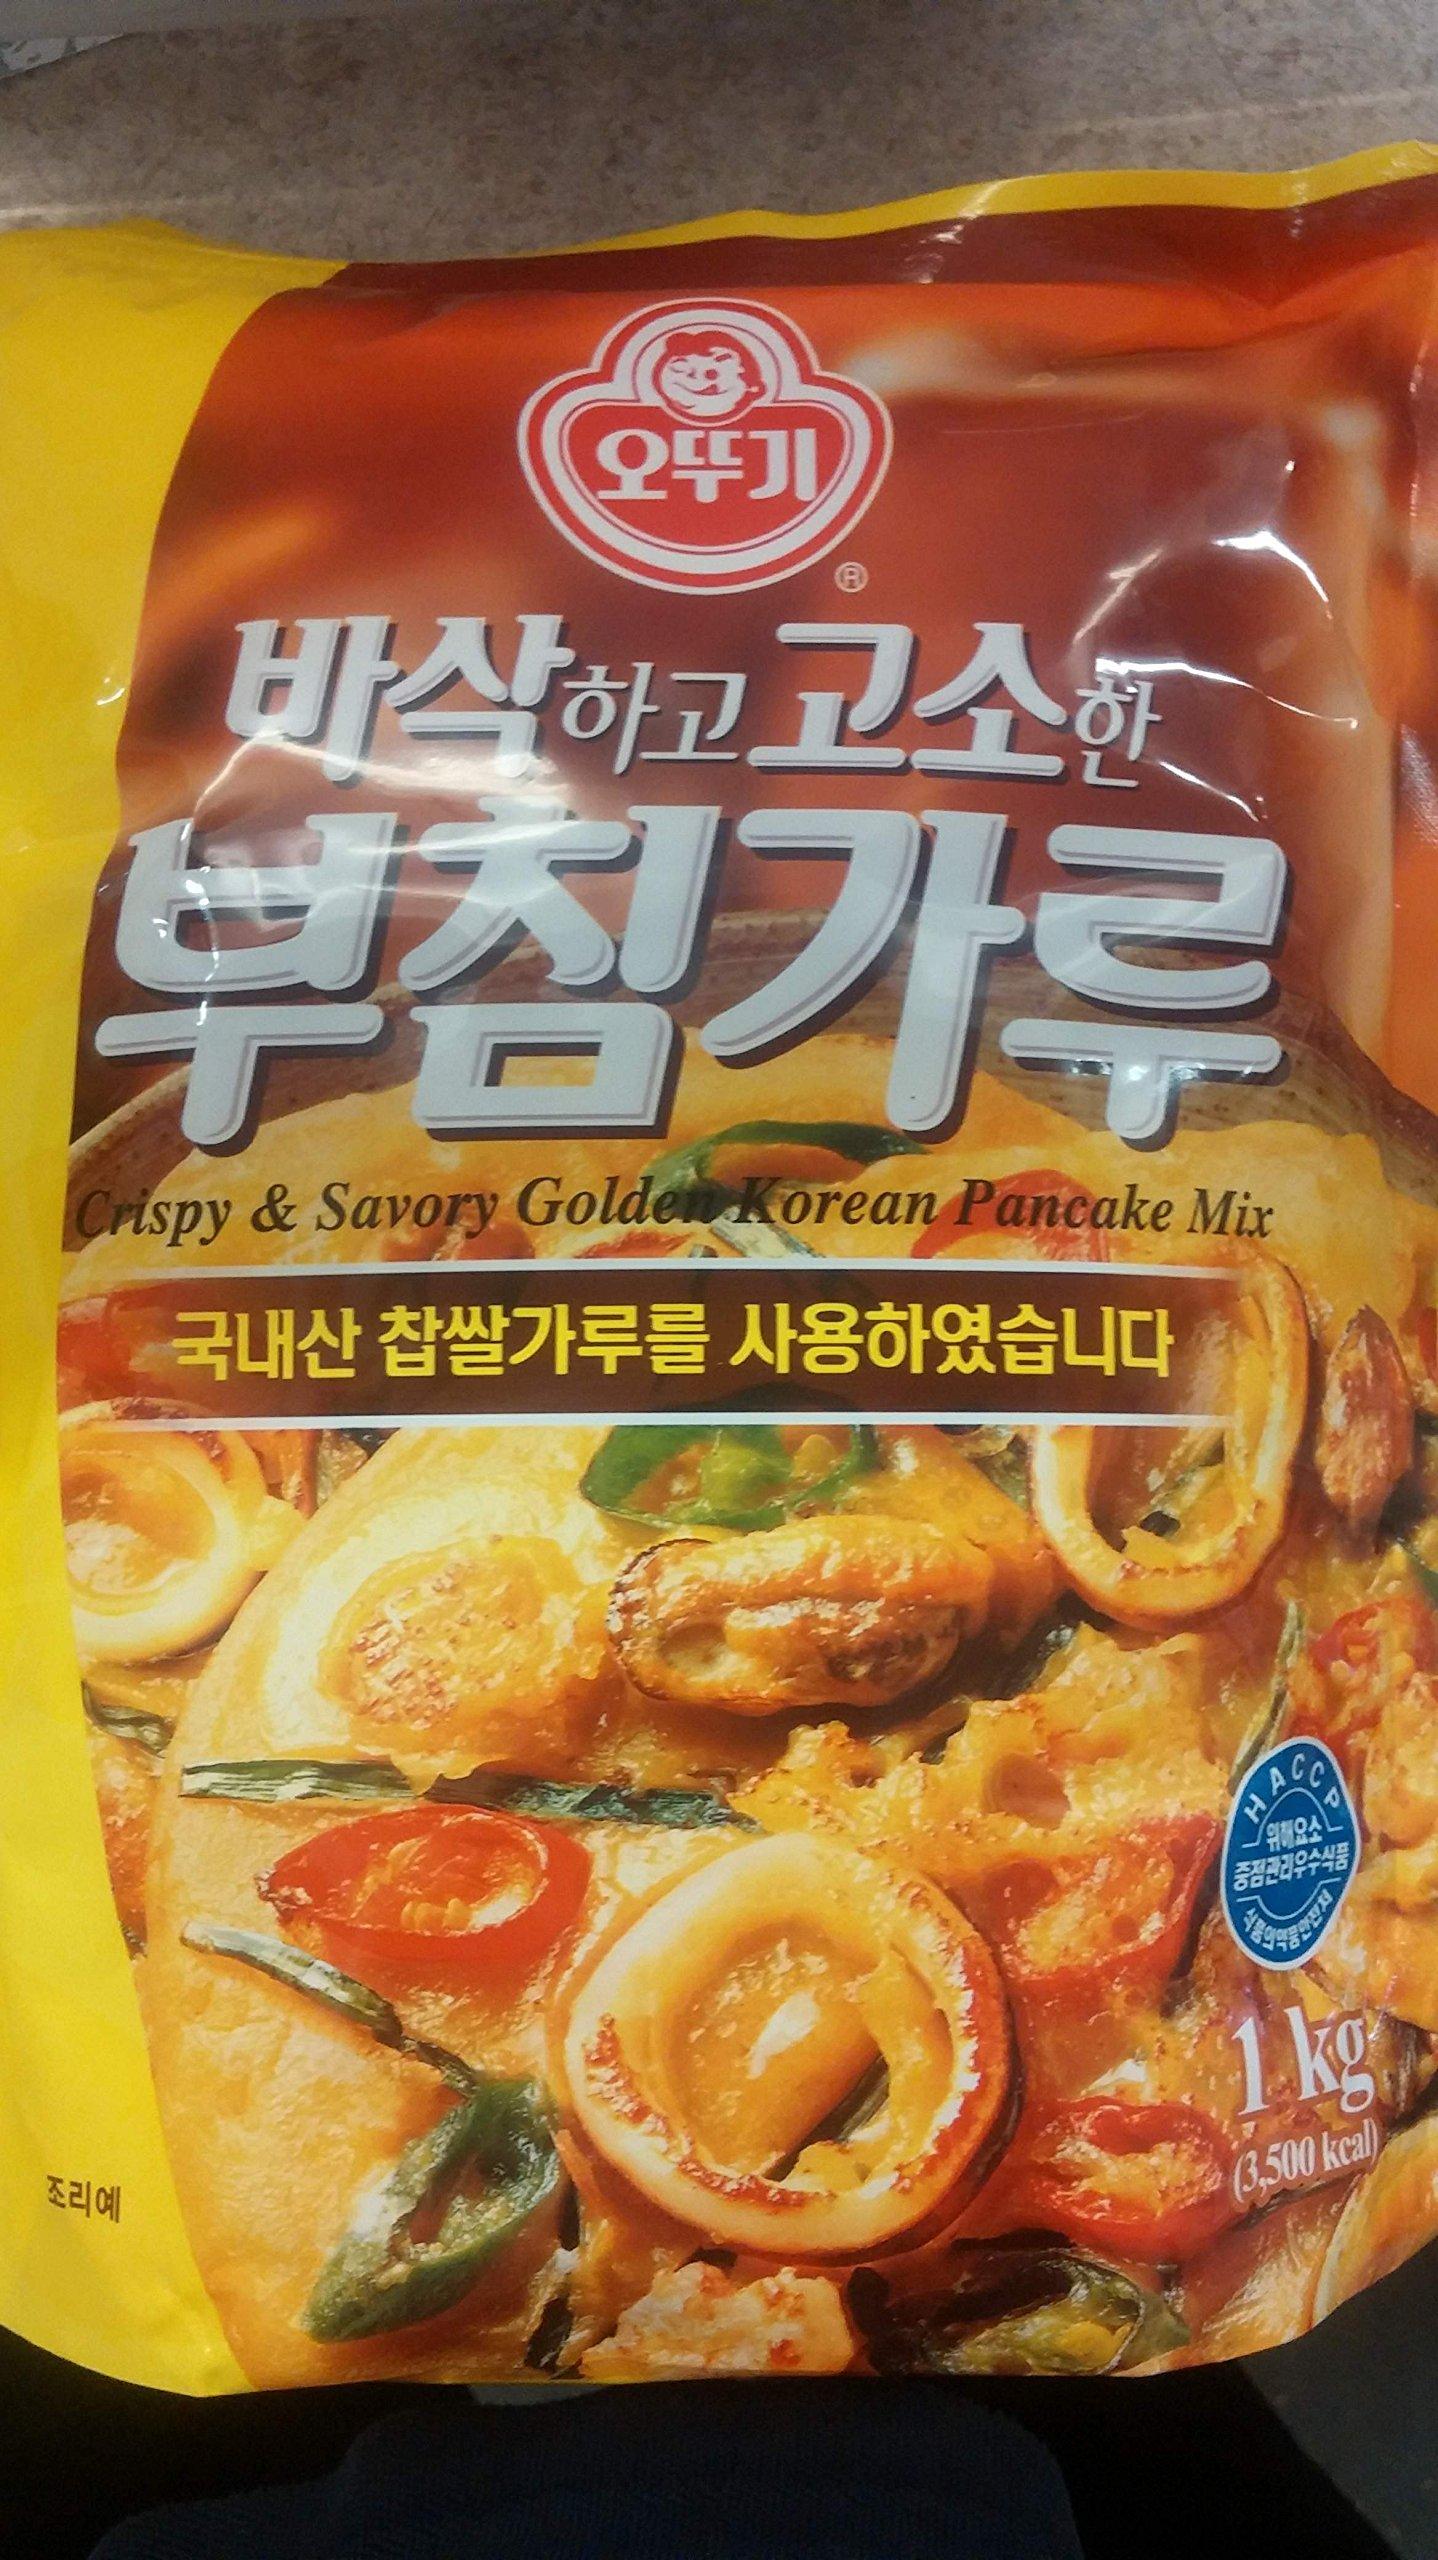 Ottogi Crispy & Savory Golden Korean Pancake Mix 1kg